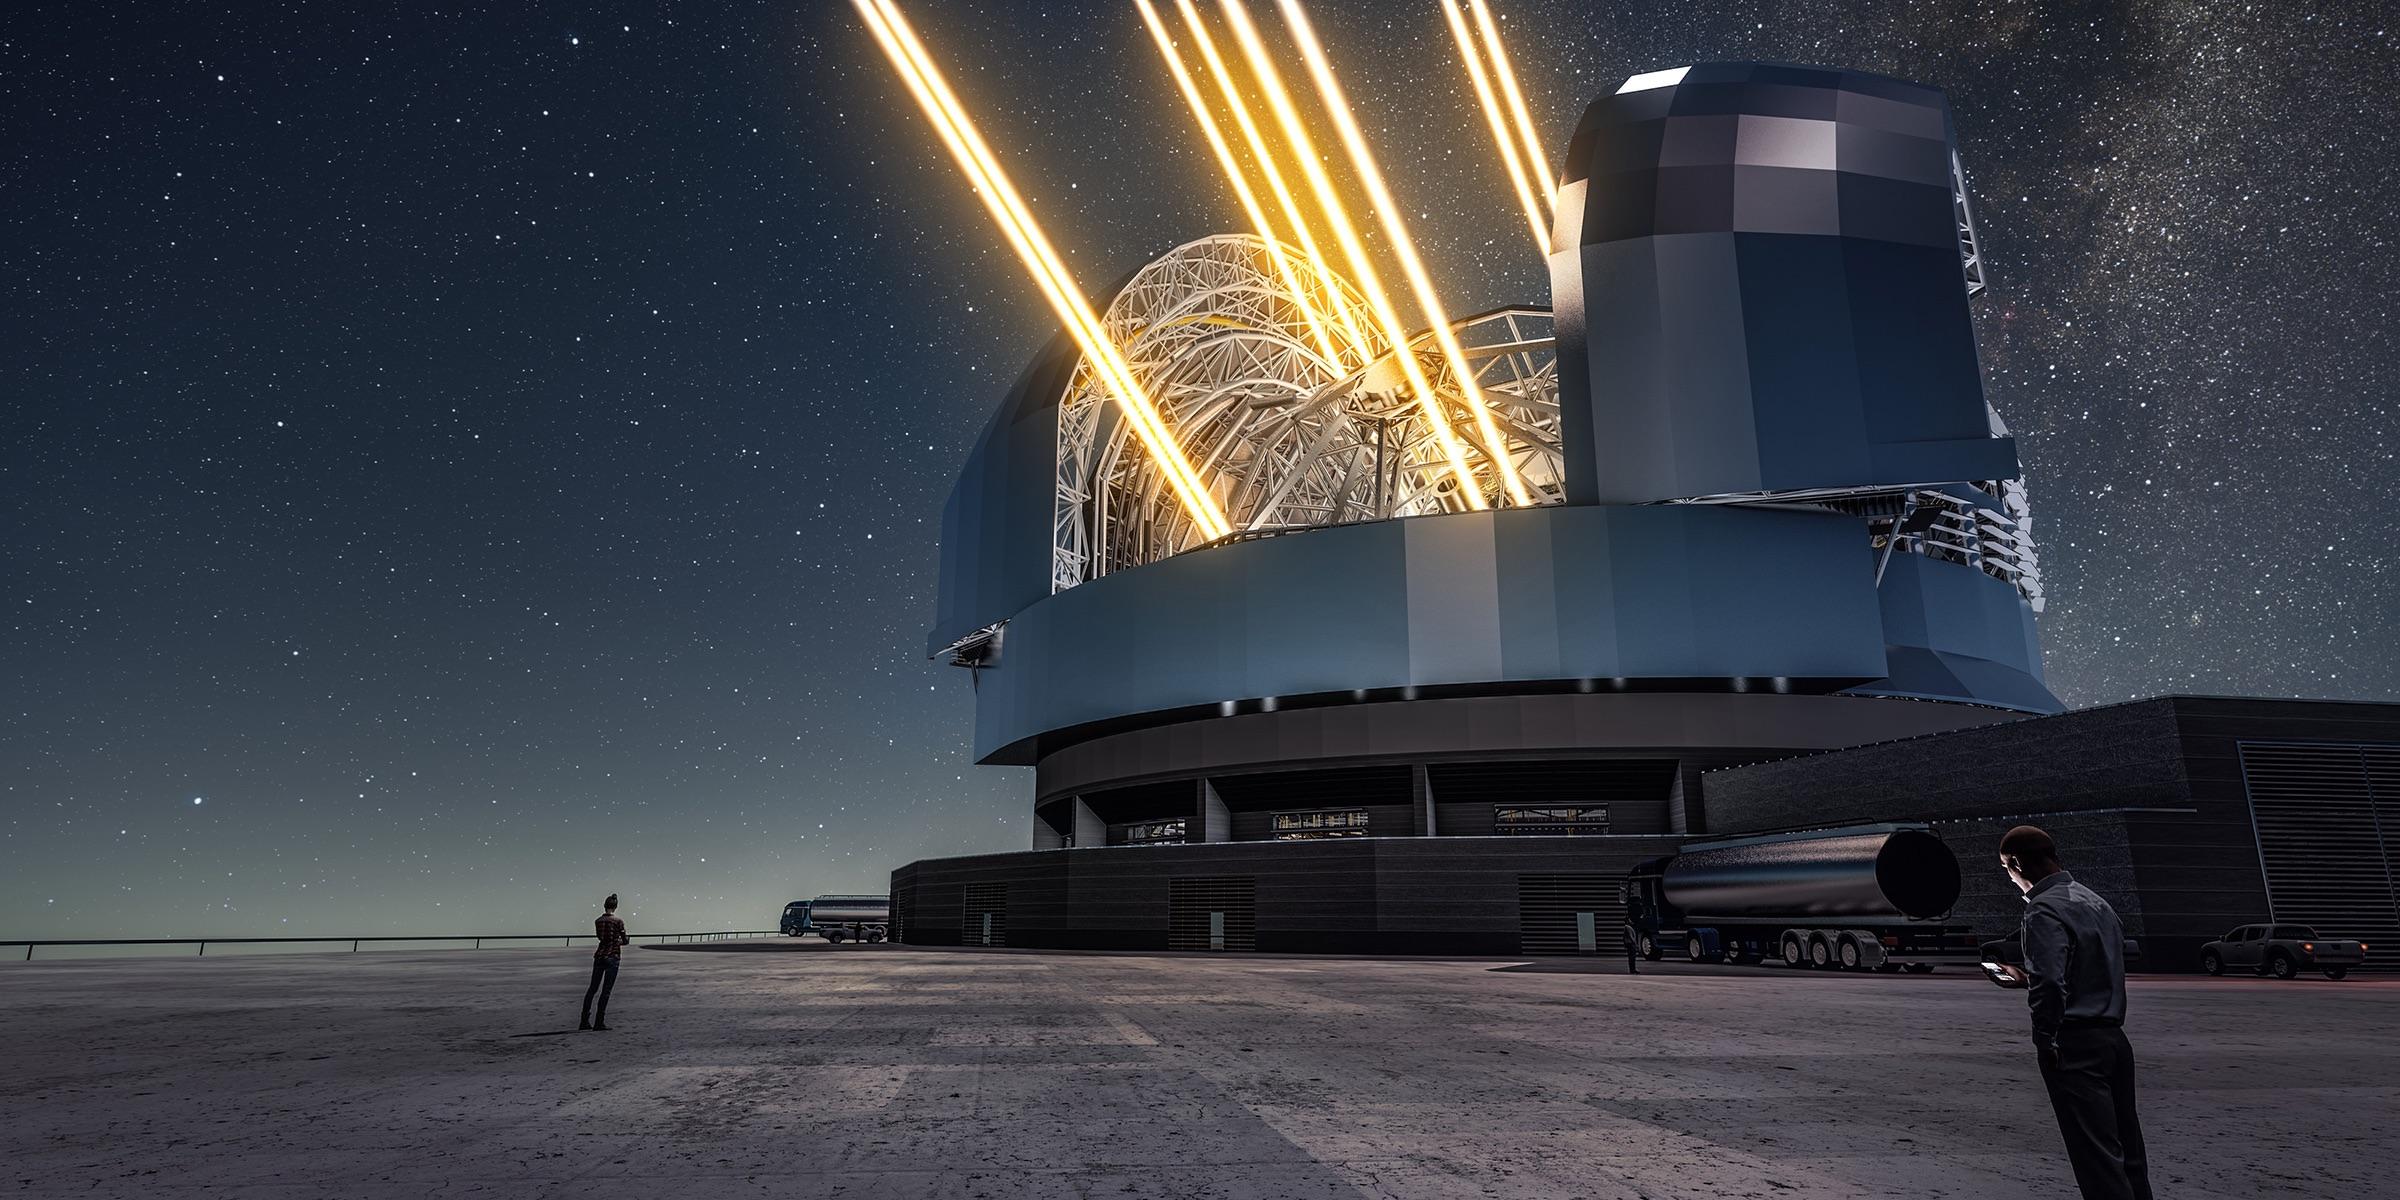 DSC-FT1119 10 Extremely Large Telescope